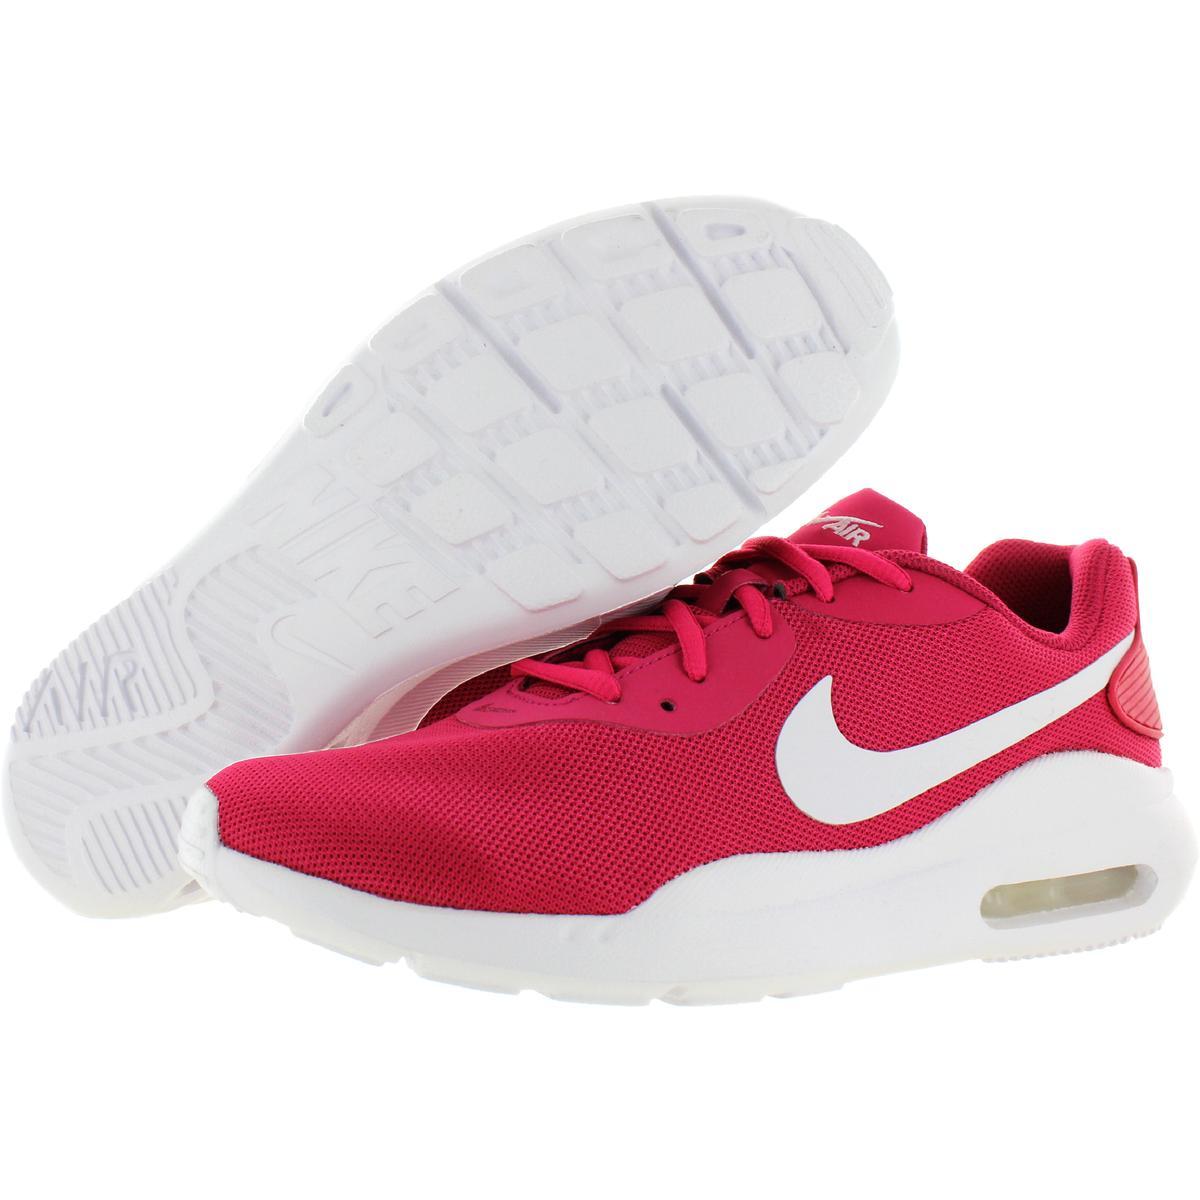 Nike-Womens-Air-Max-Oketo-Mesh-Comfort-Trainers-Running-Shoes-Sneakers-BHFO-7216 thumbnail 6